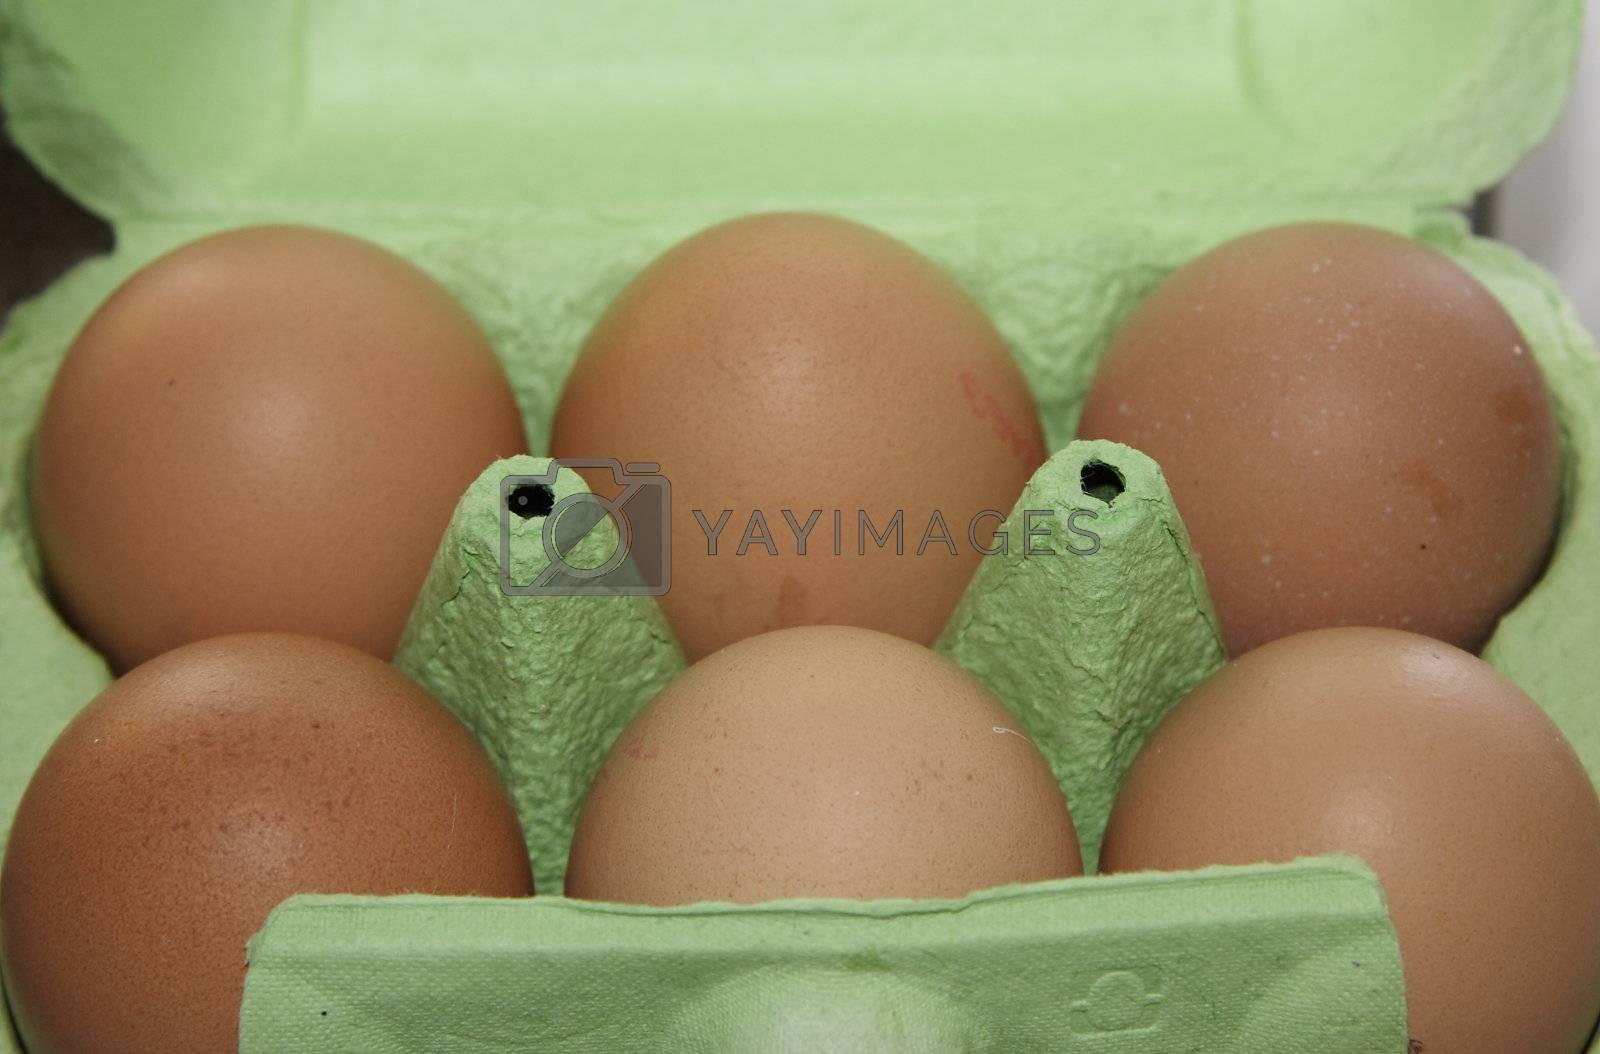 half a dozen eggs boxed in a green box